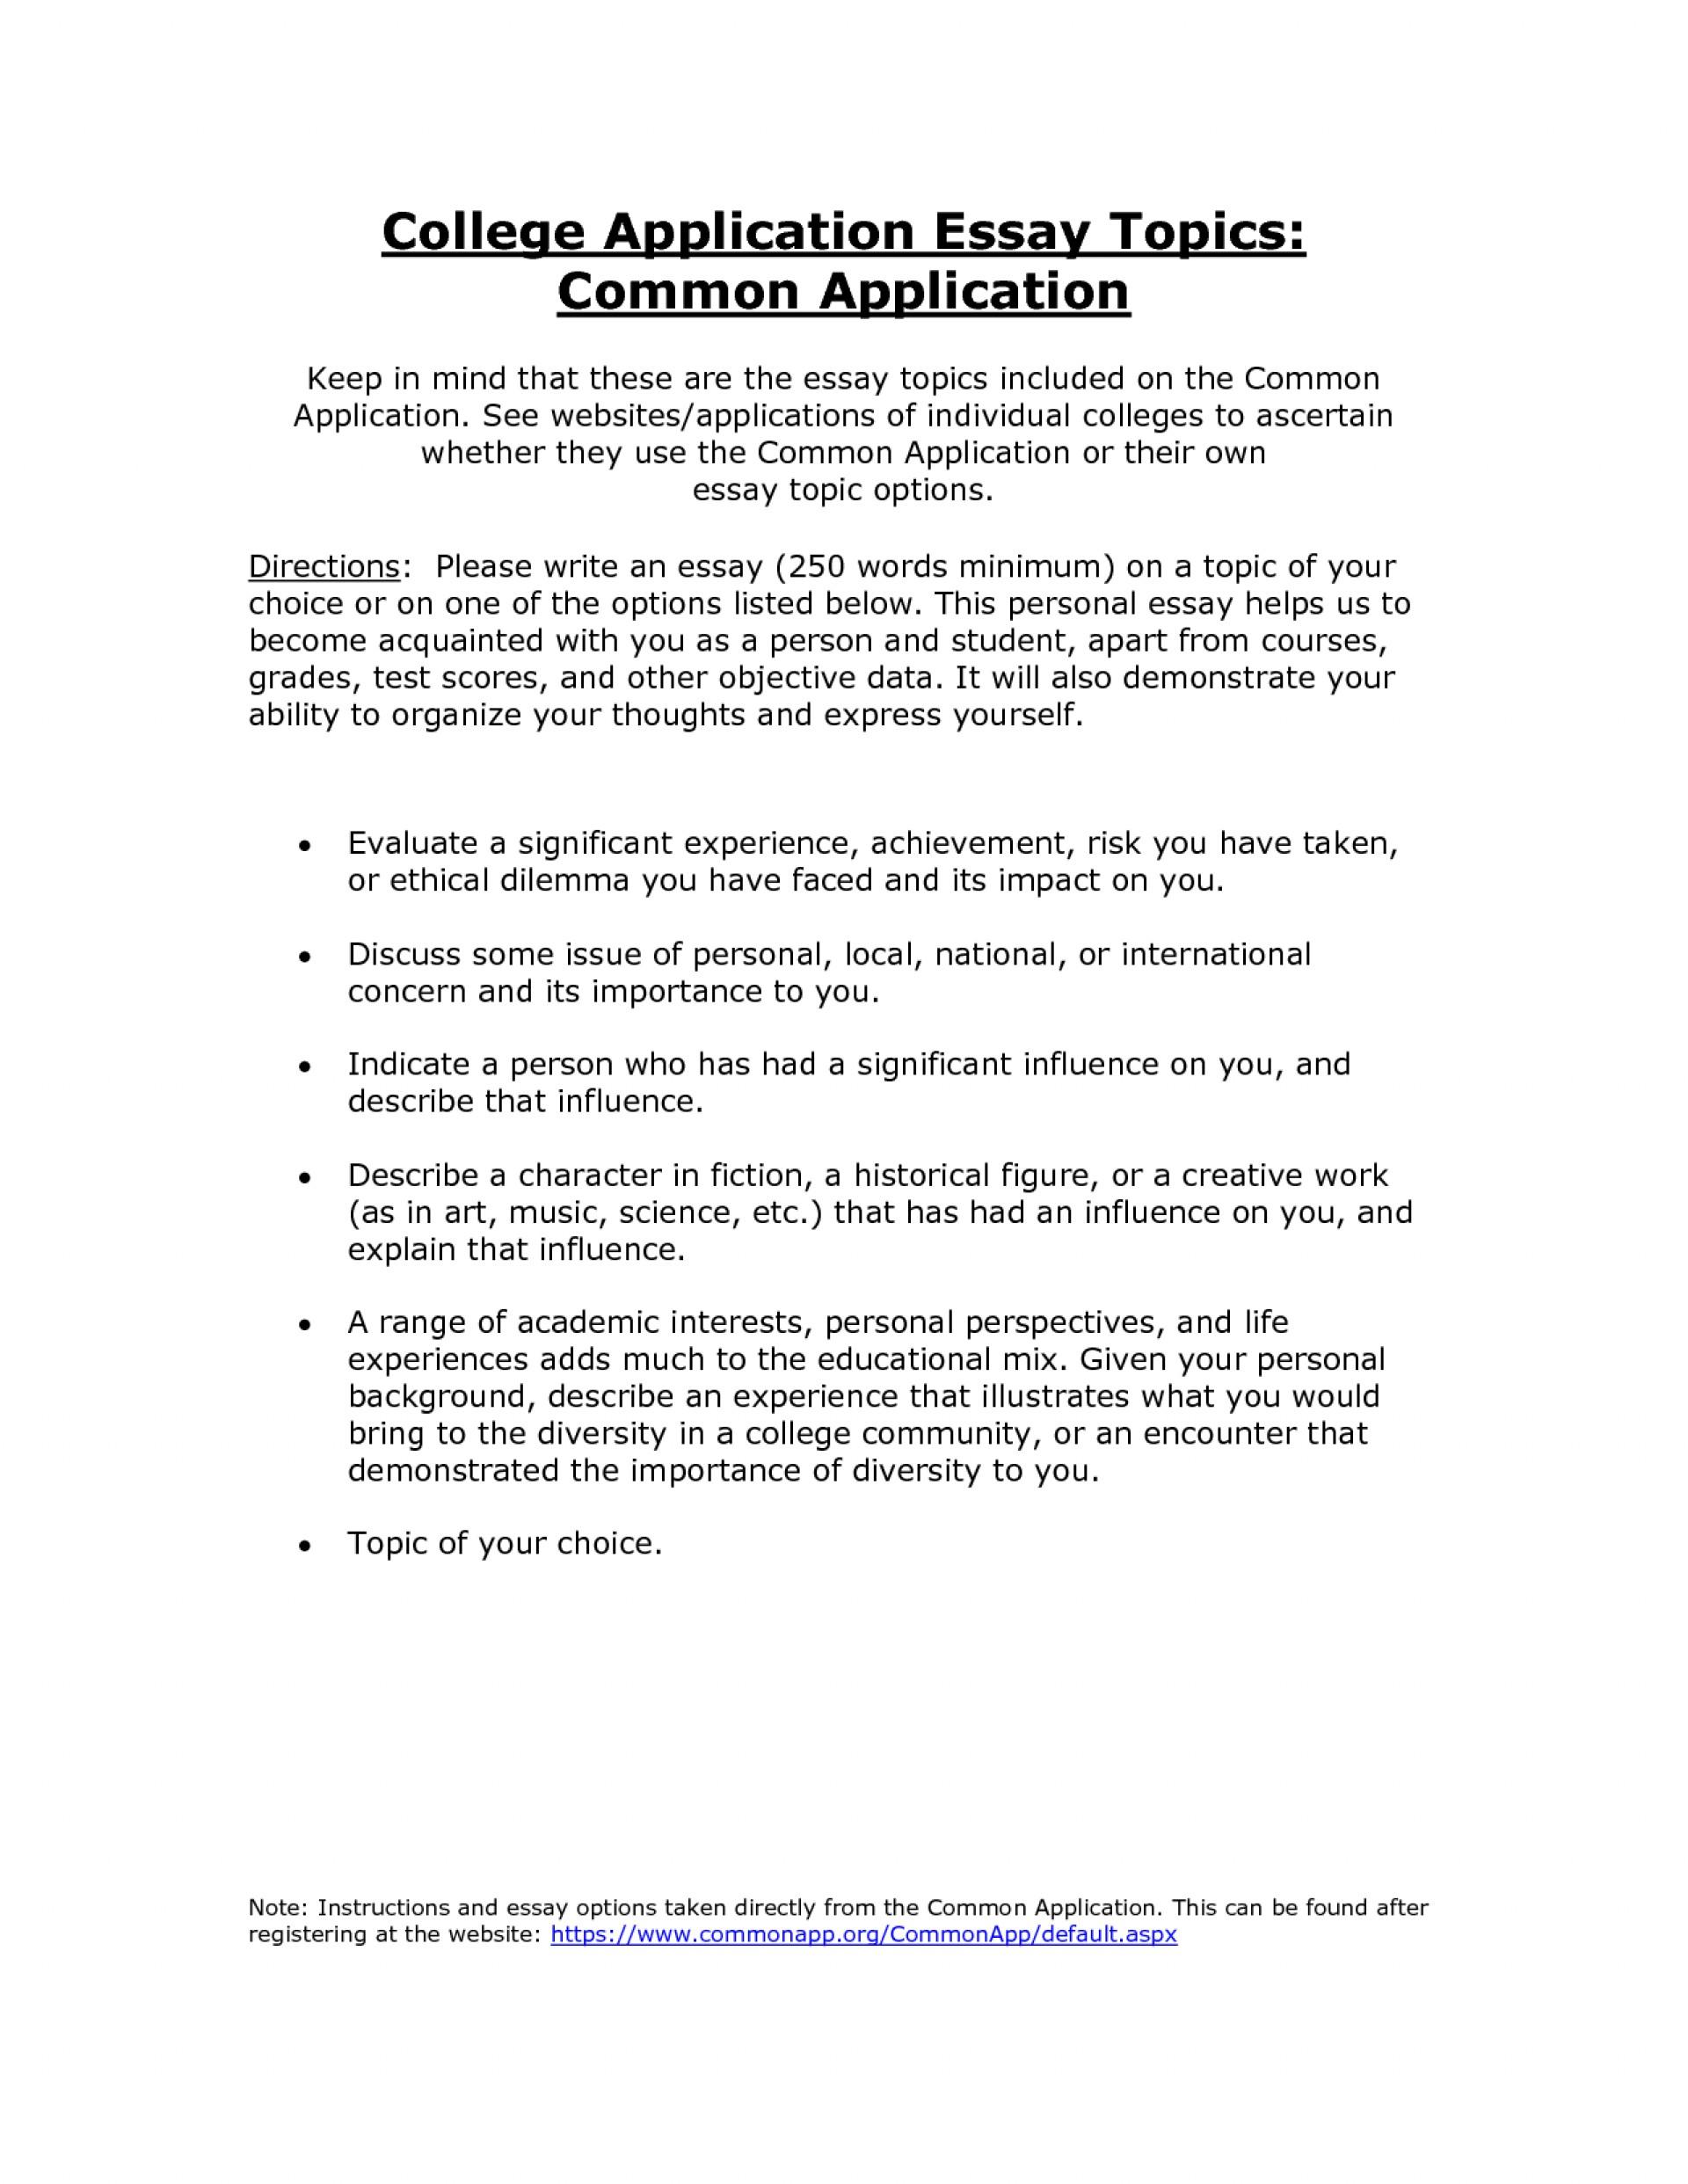 006 Vzmthii0b2 Common App Examples Best Example Essays Application Essay Harvard Prompts 2014-15 1920